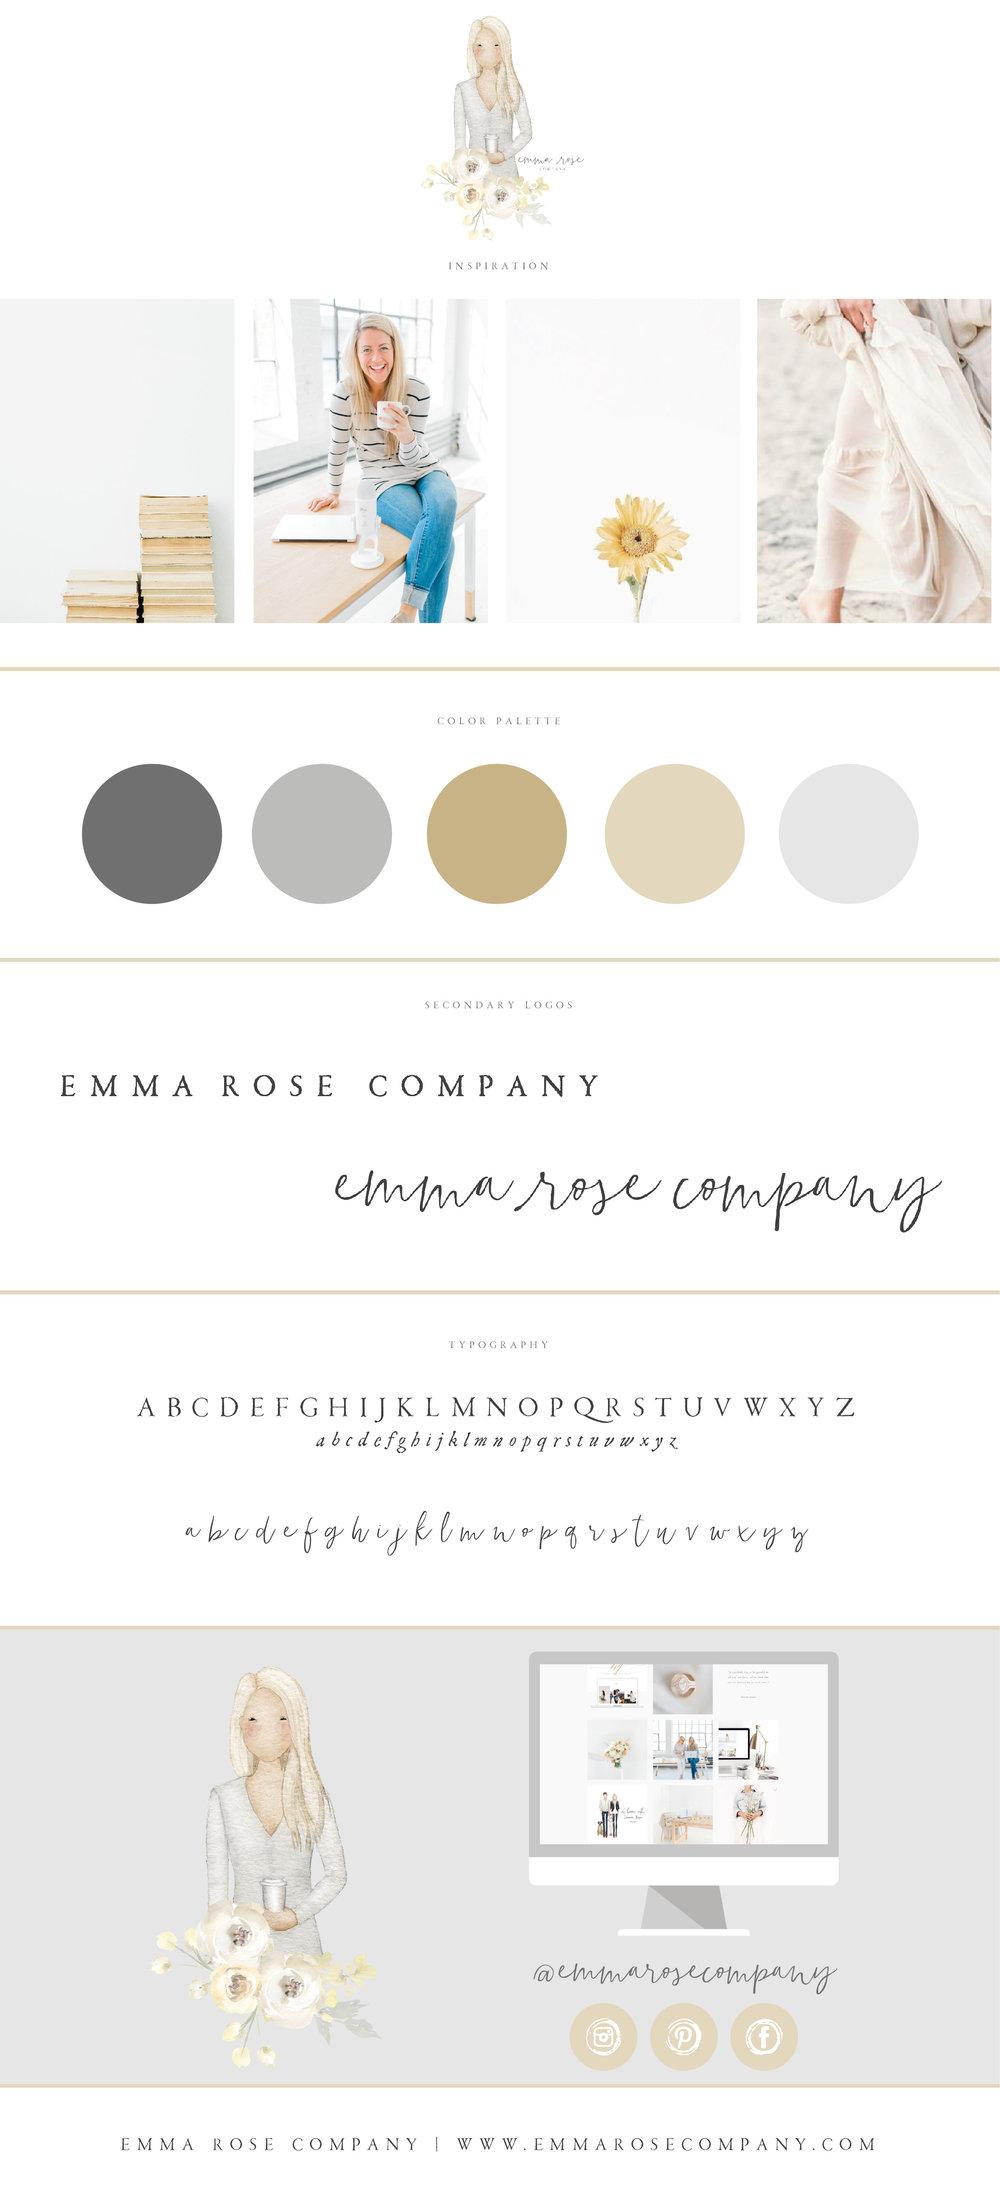 Emma Rose Company Website Launch   Squarespace Website Designer For Photographers   A Branding Journey Emma Rose Photographer Brand Inspiration Board.jpg